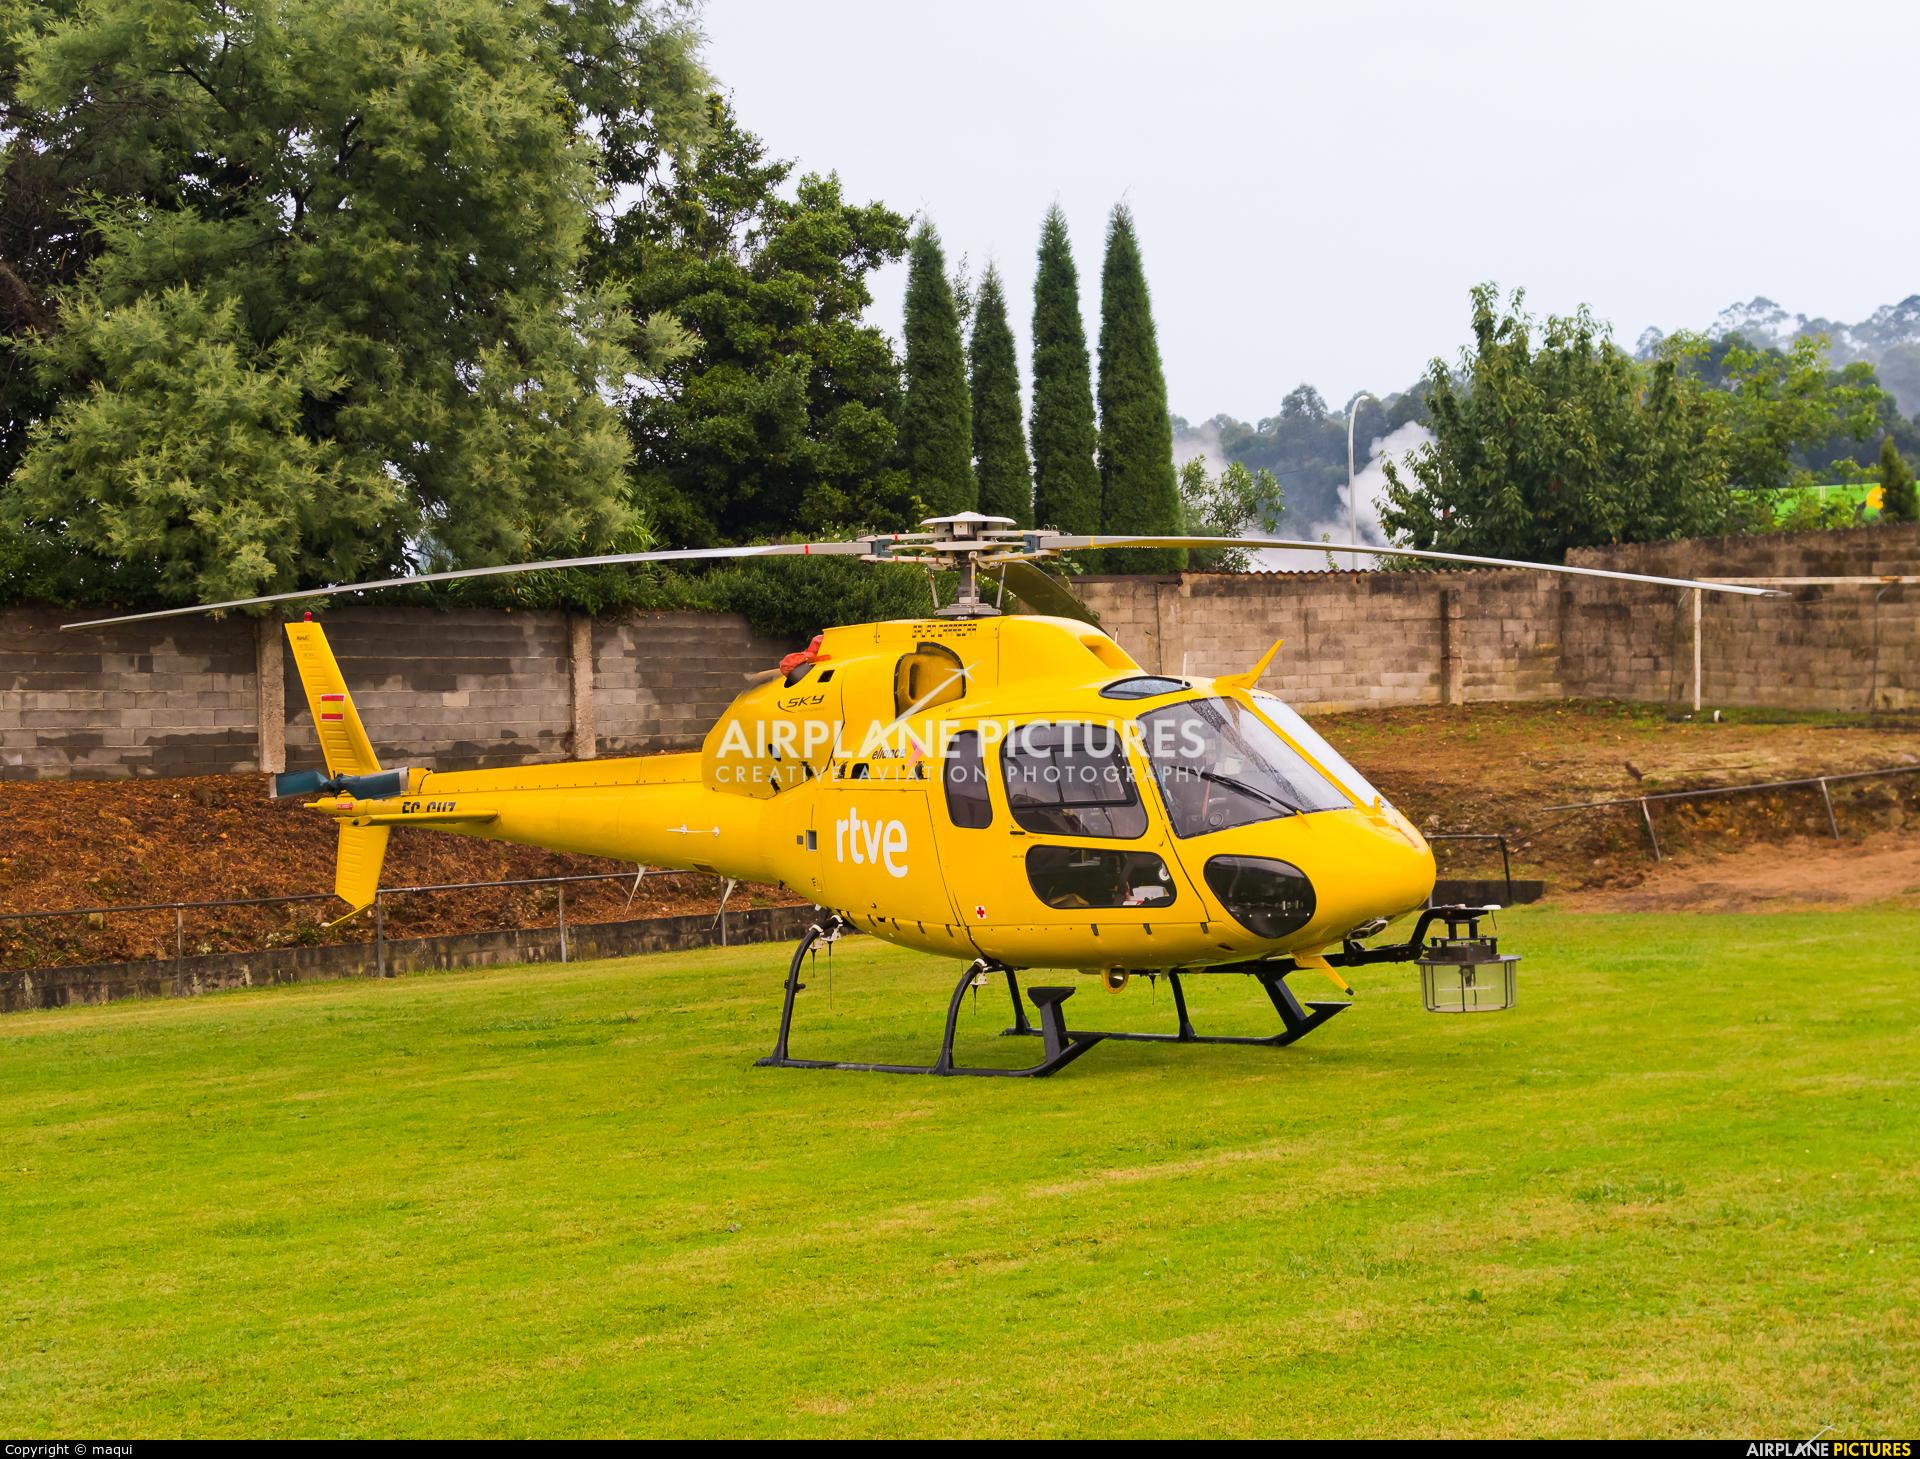 Eliance - Habock Aviation Group EC-GUZ aircraft at Lugo - Off Airport